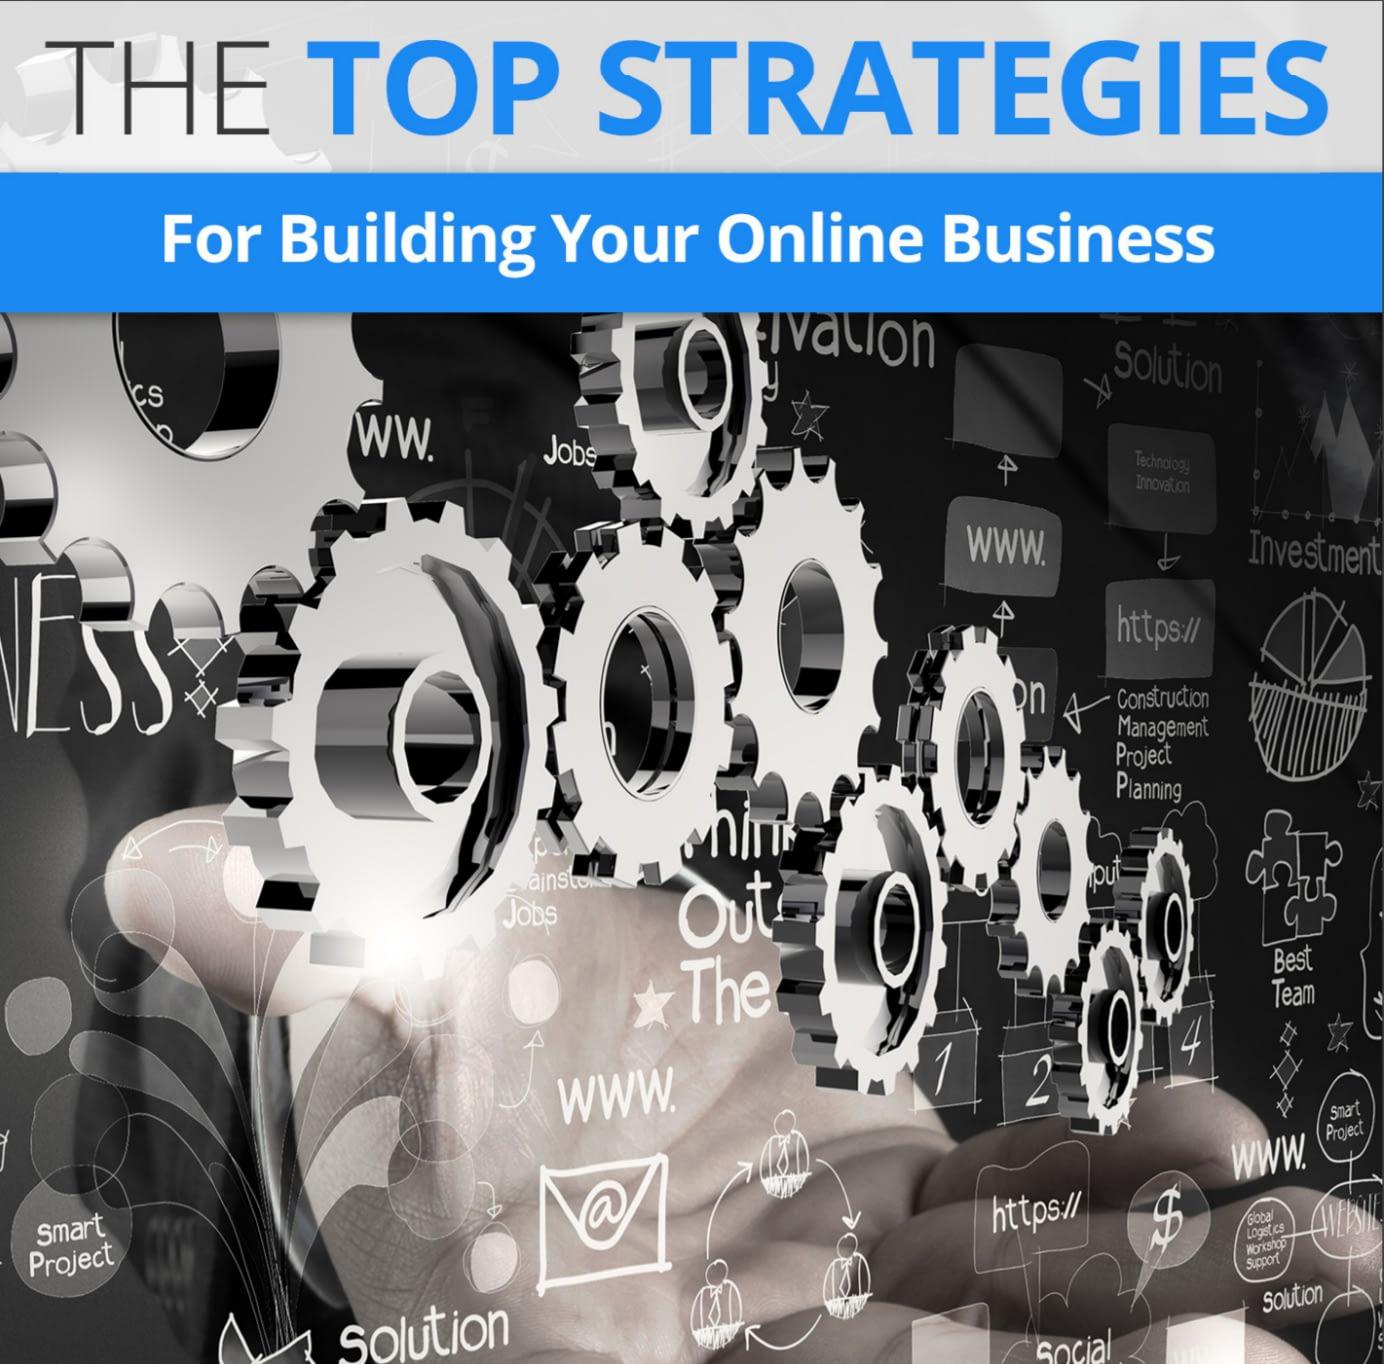 Top Strategies Book Cover